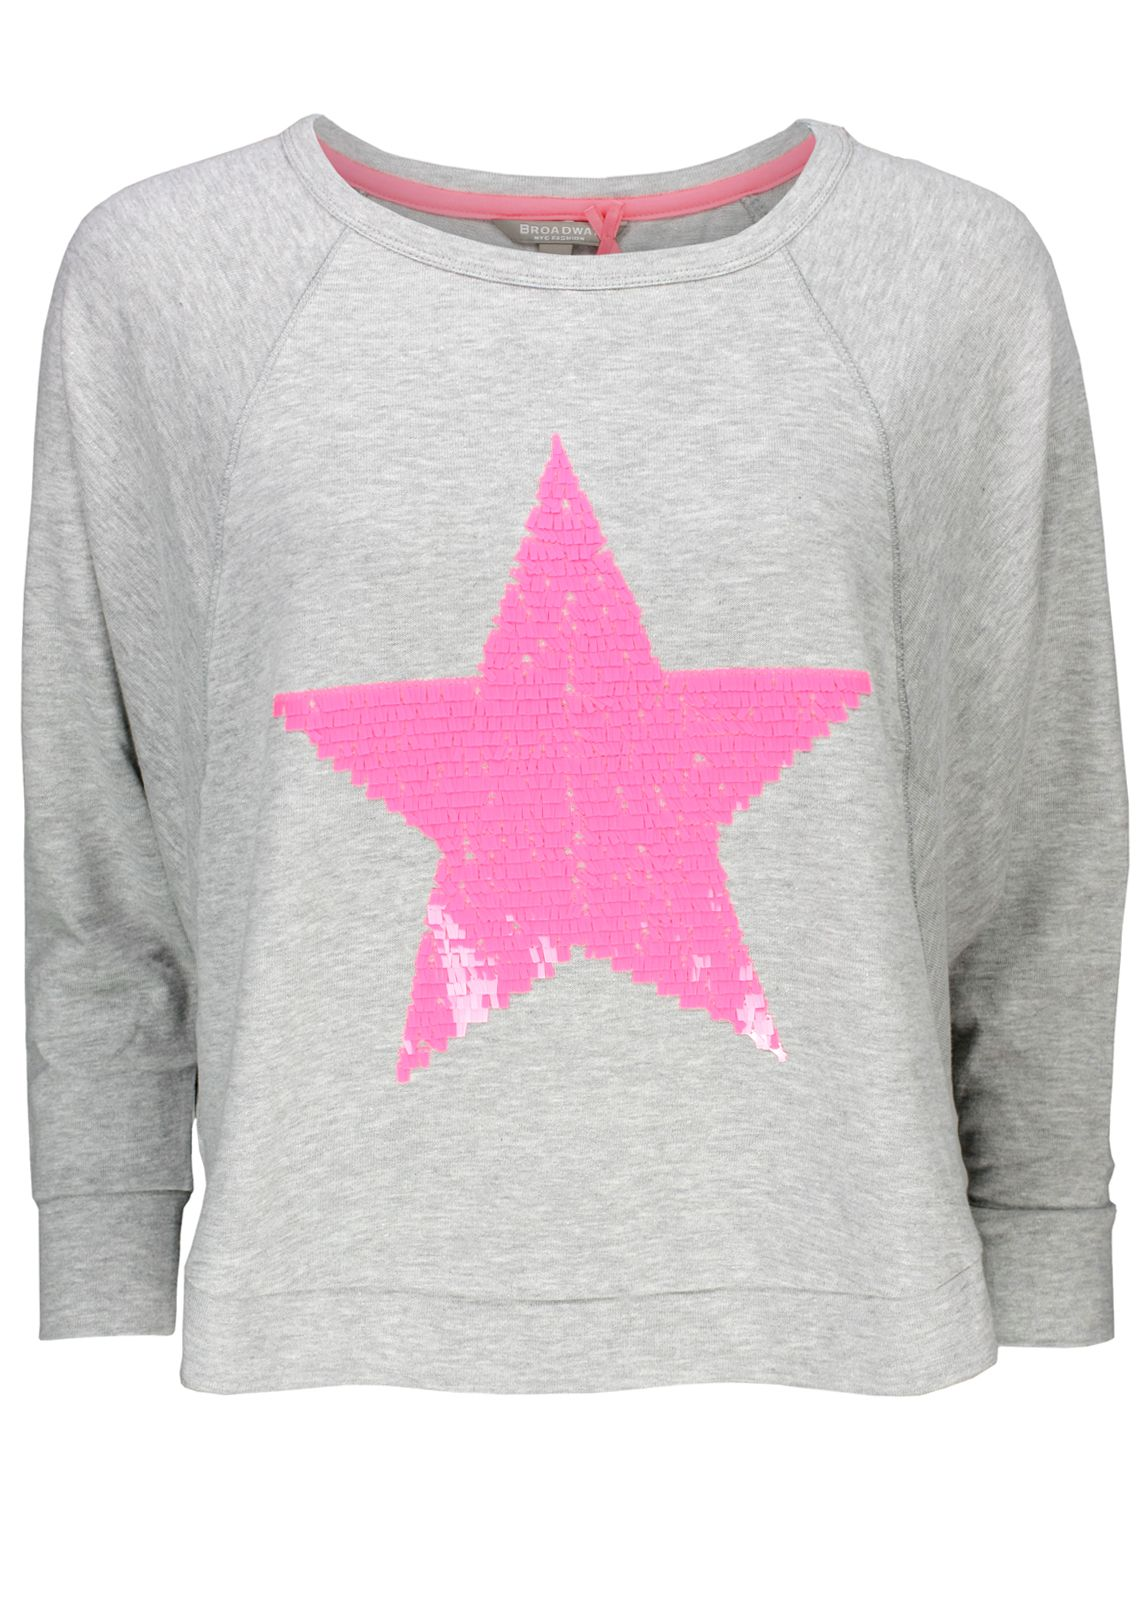 6972846bee747b Broadway NYC Pullover Stern-Pulli Pink - fettebeute Online Shop